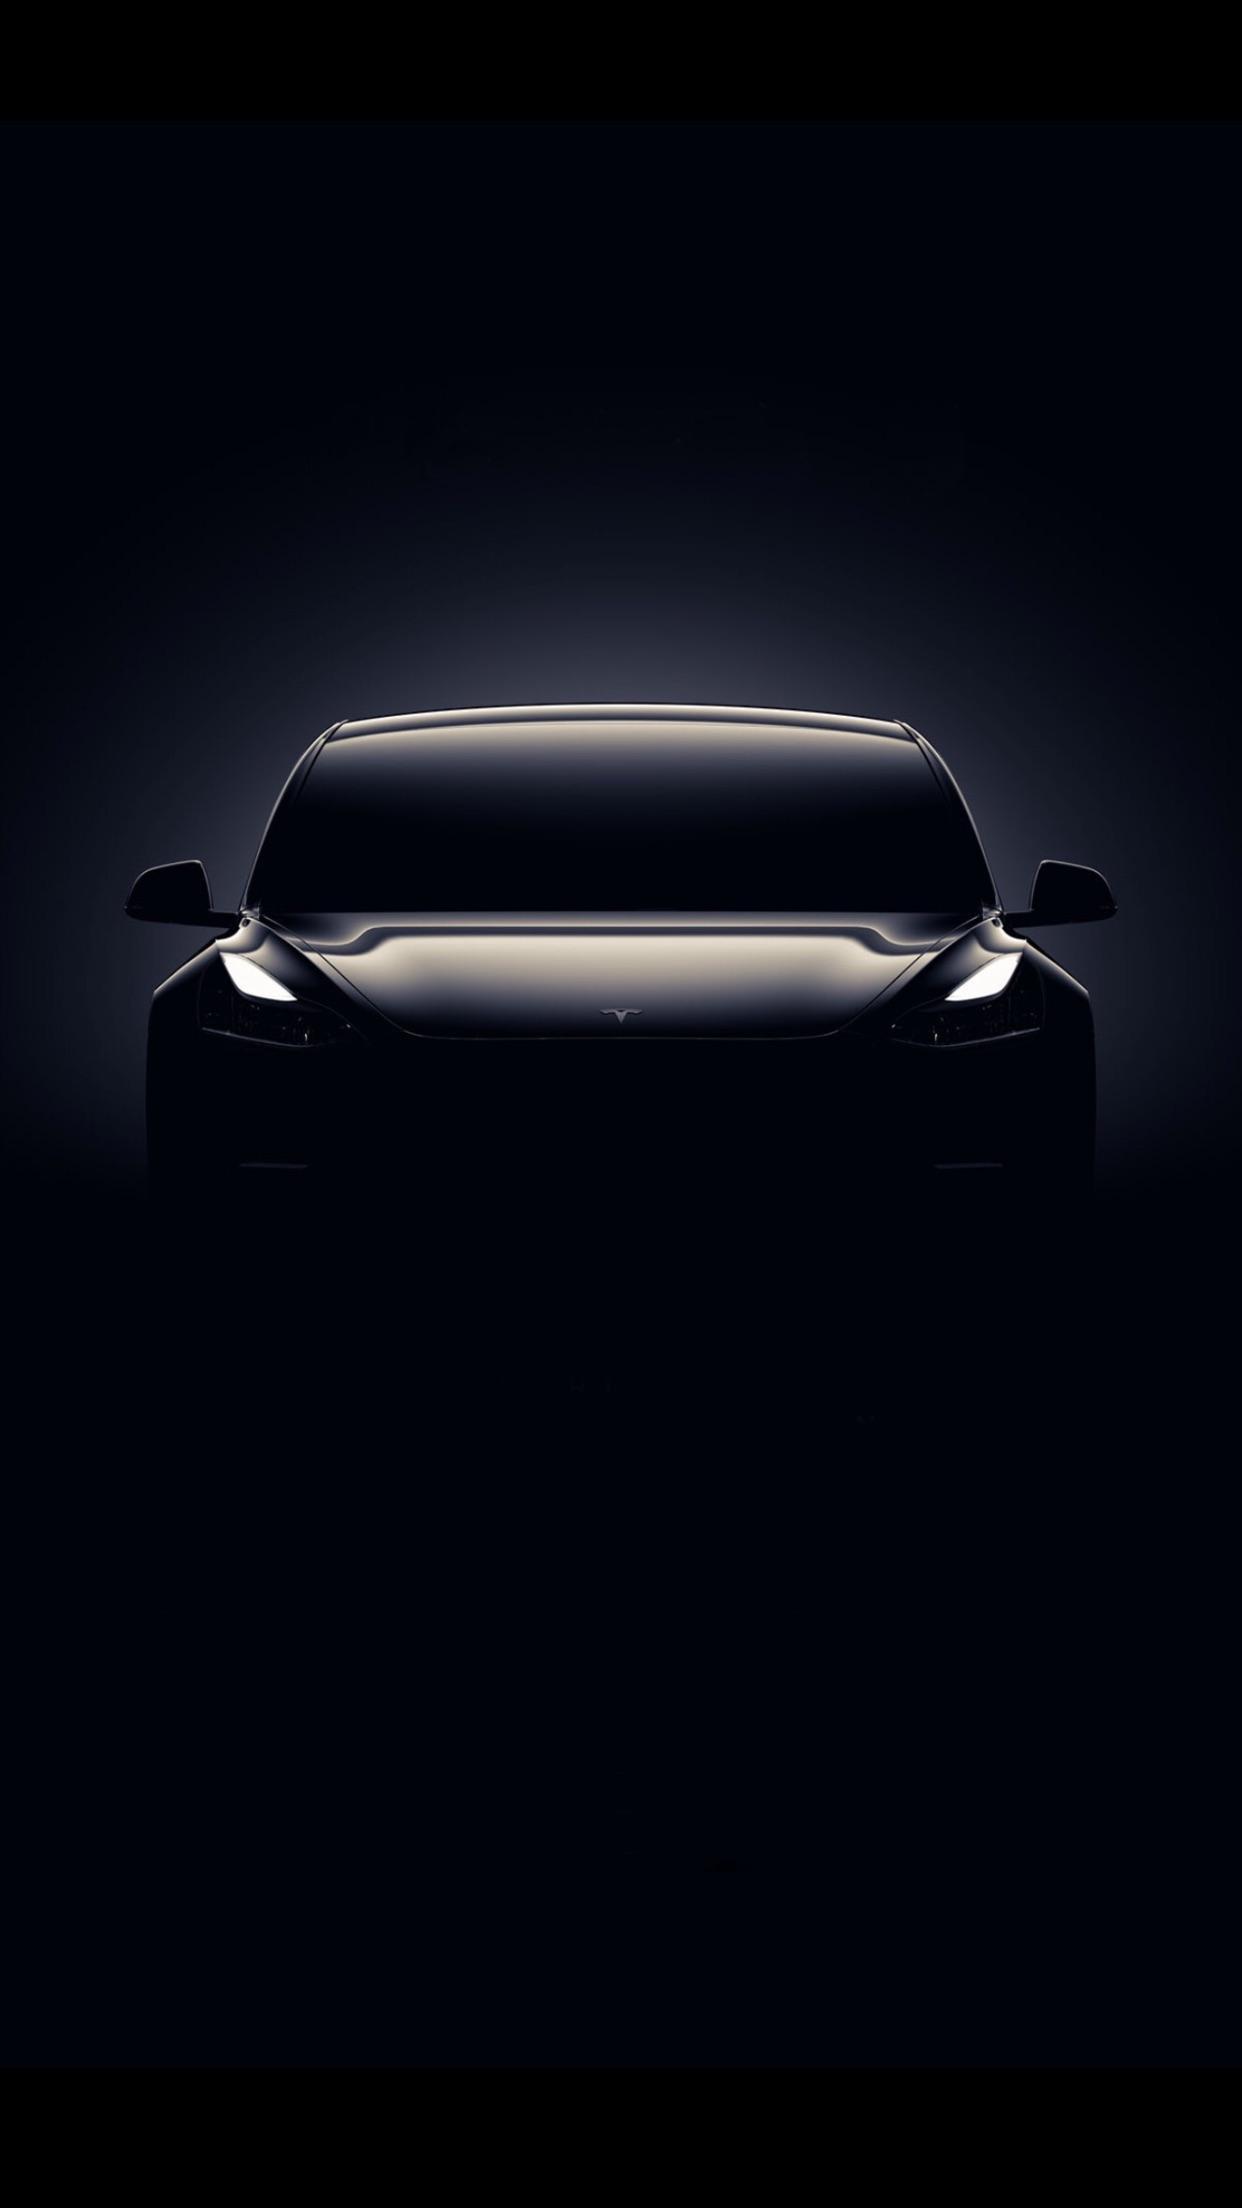 Tesla Phone Wallpapers   Top Tesla Phone Backgrounds 1242x2208